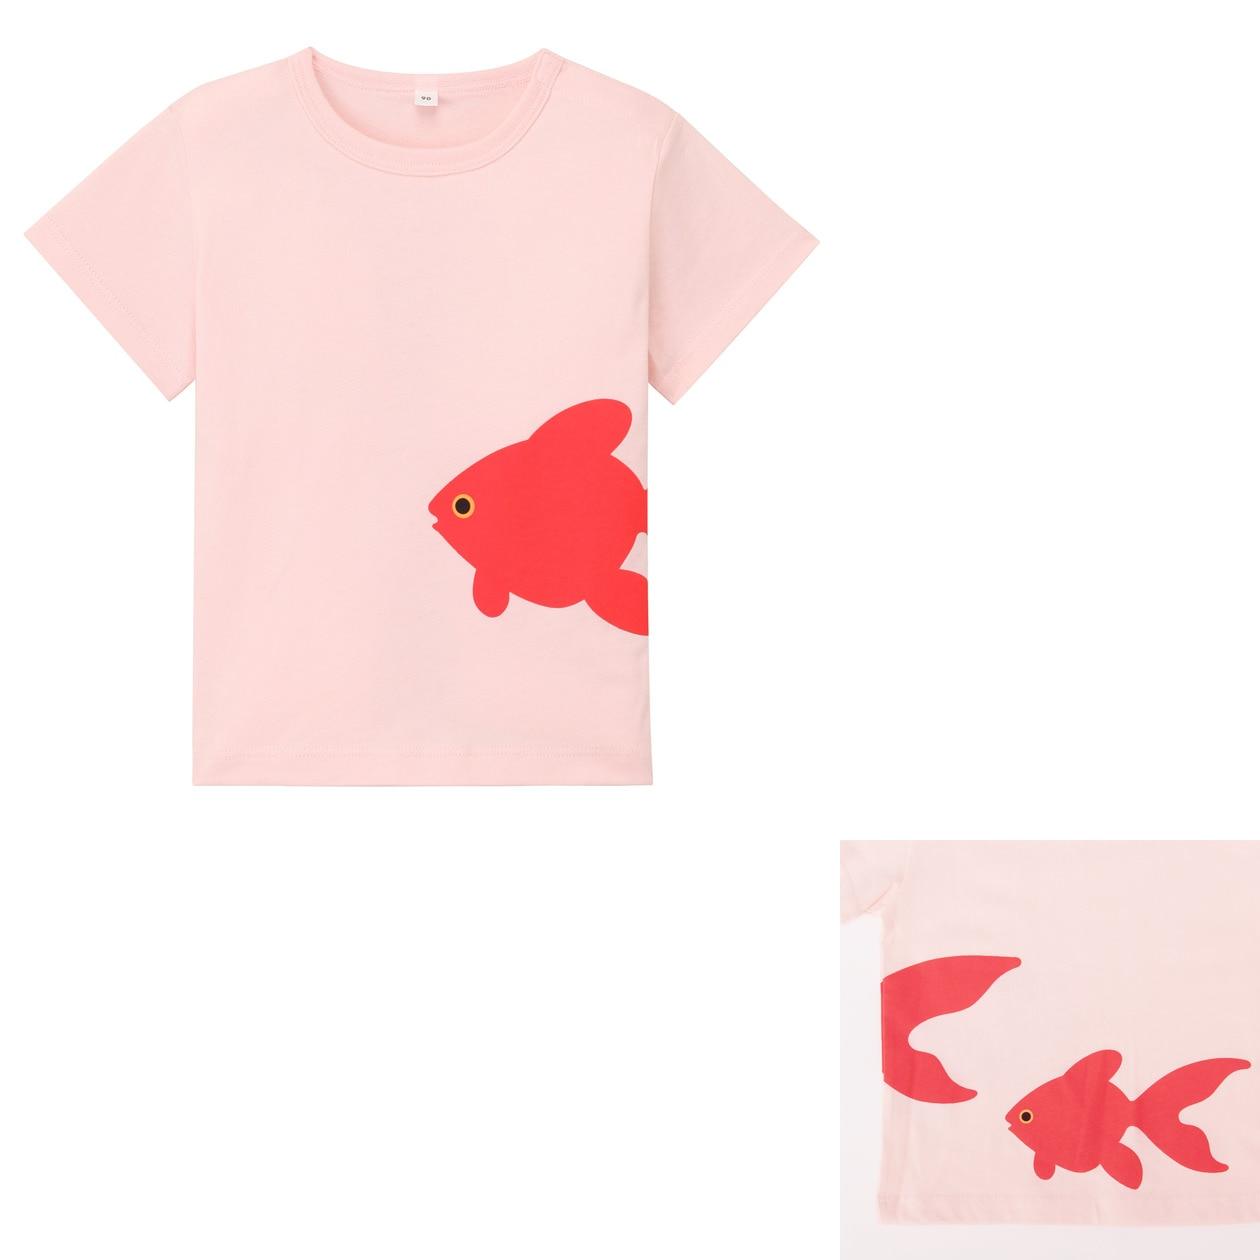 Organic cotton printed t shirt baby 100 goldfish muji for Sustainable t shirt printing